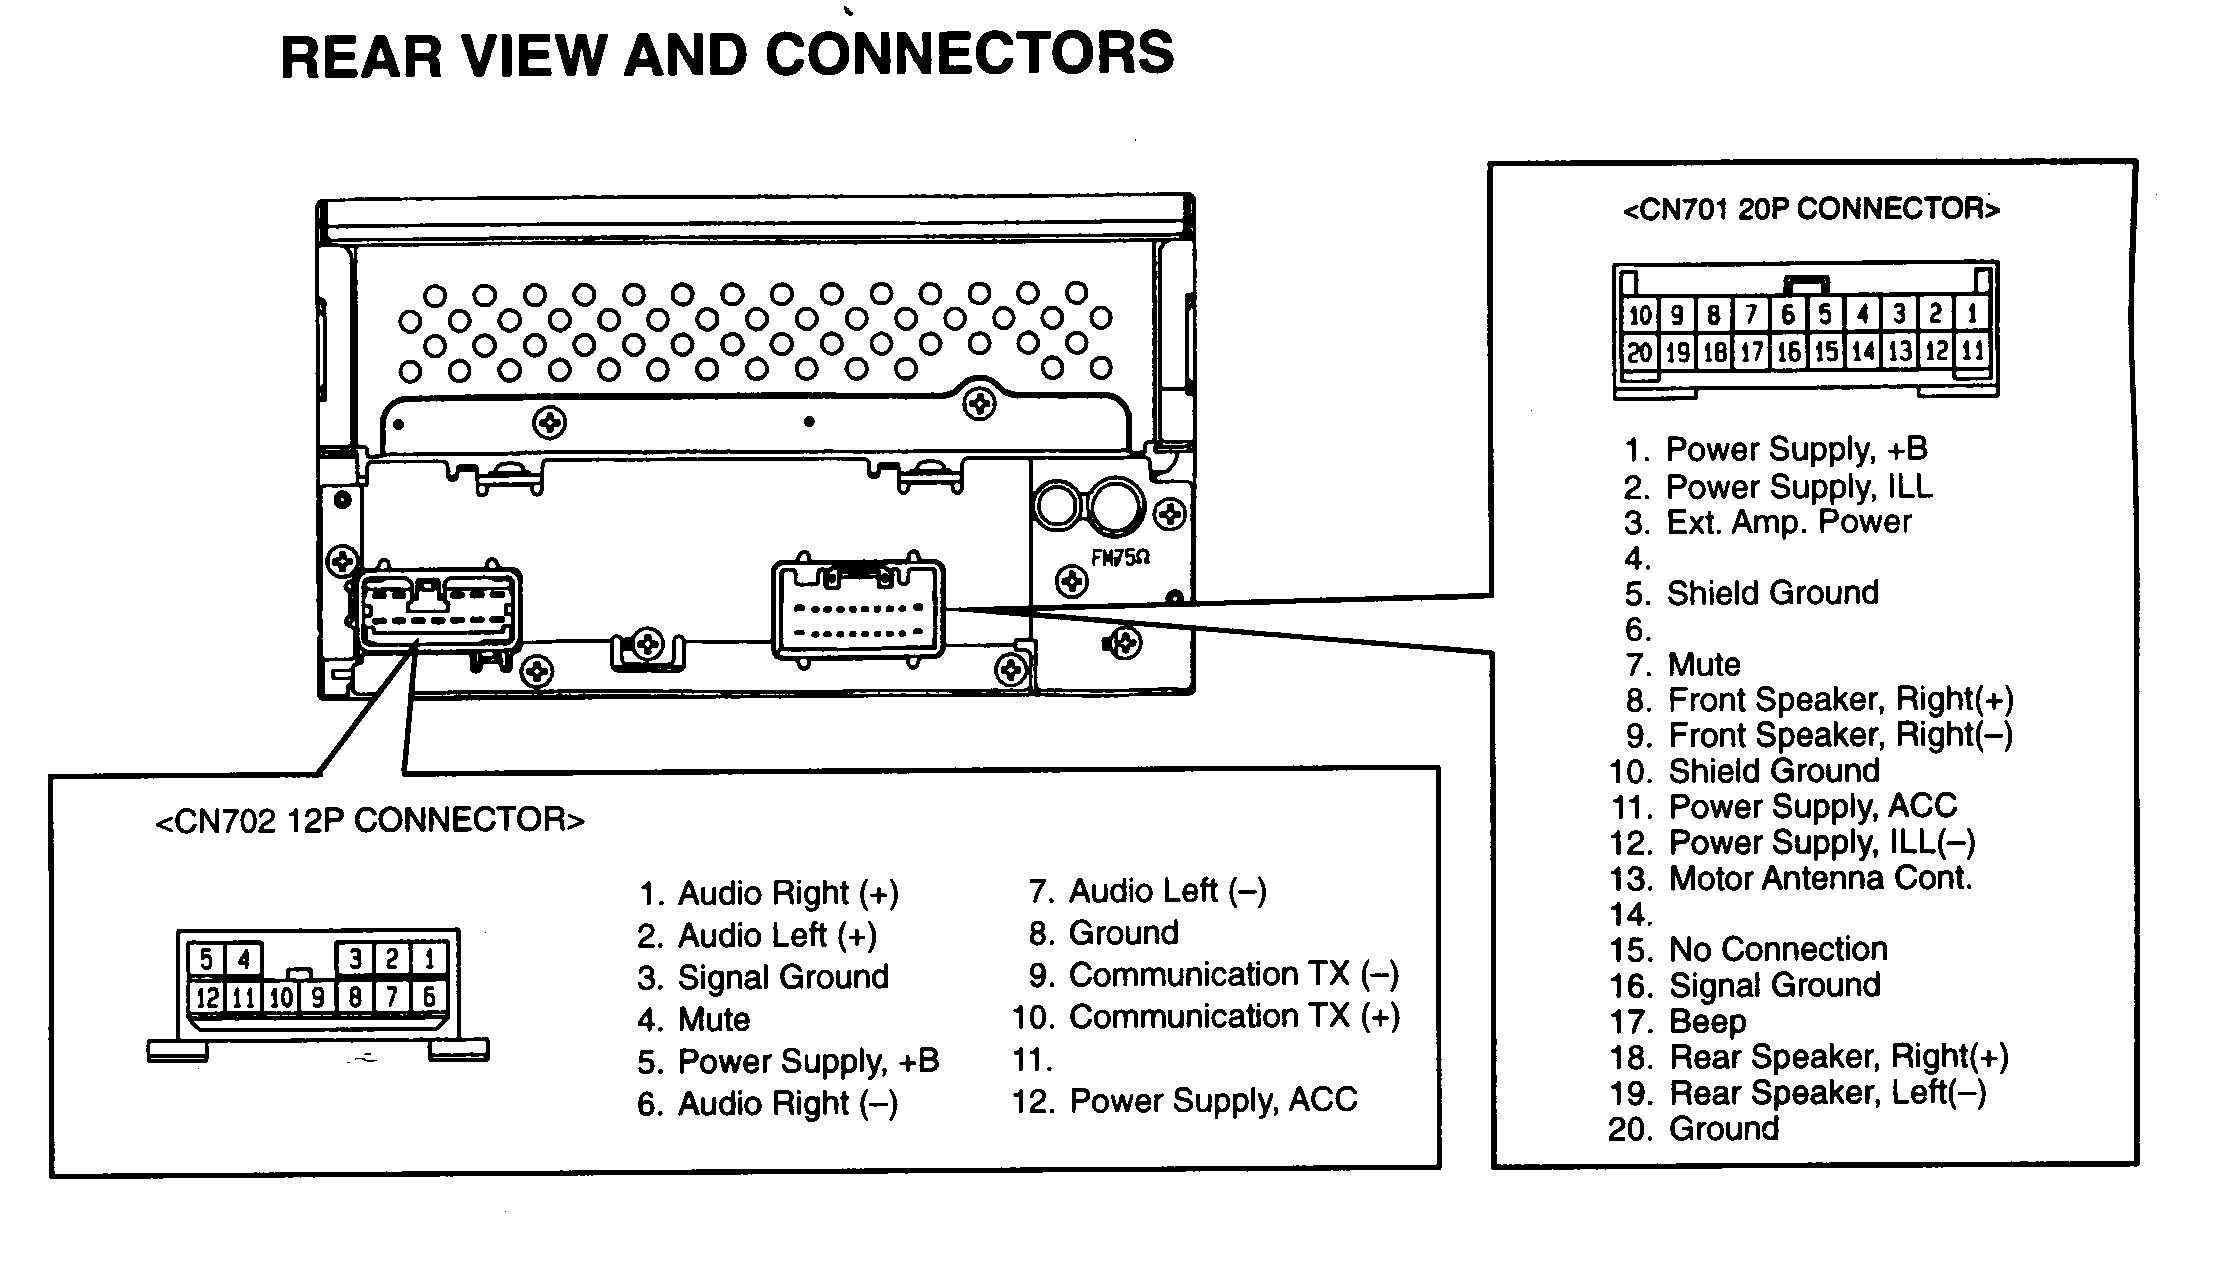 2001 Toyota Camry Wiring Diagram New Vdj79 In Radio Britishpanto Diagrama